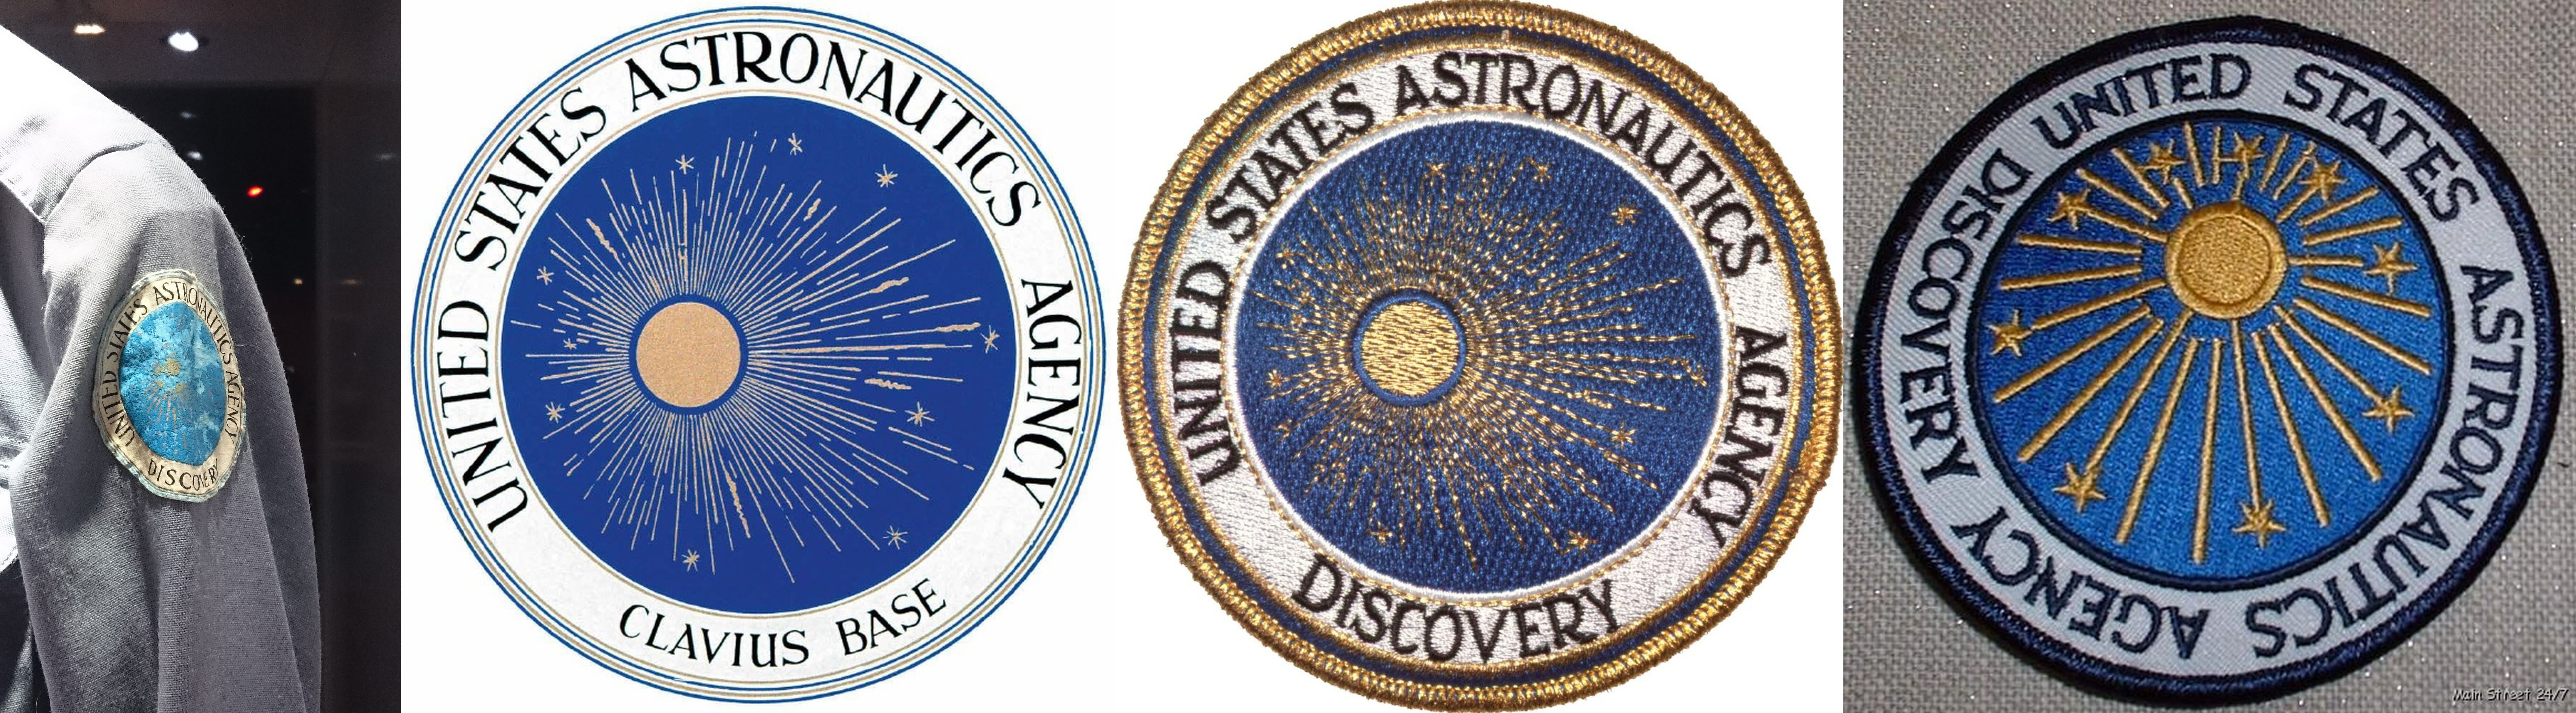 Discovery badge.jpg